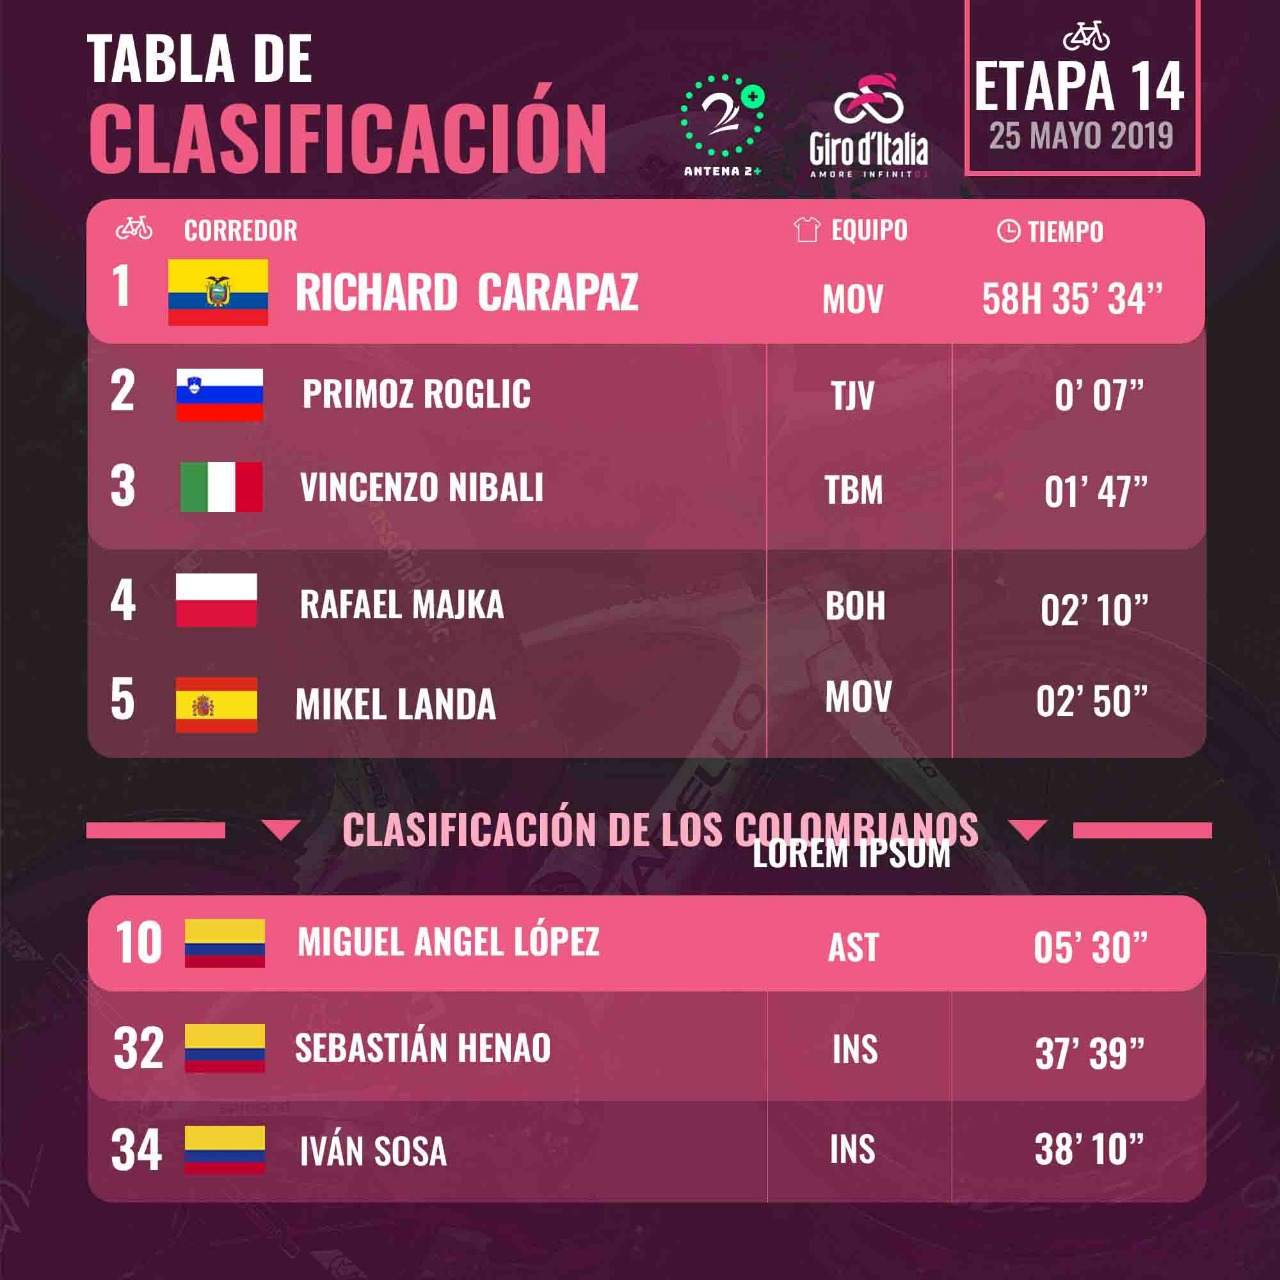 Giro de Italia - Etapa 14